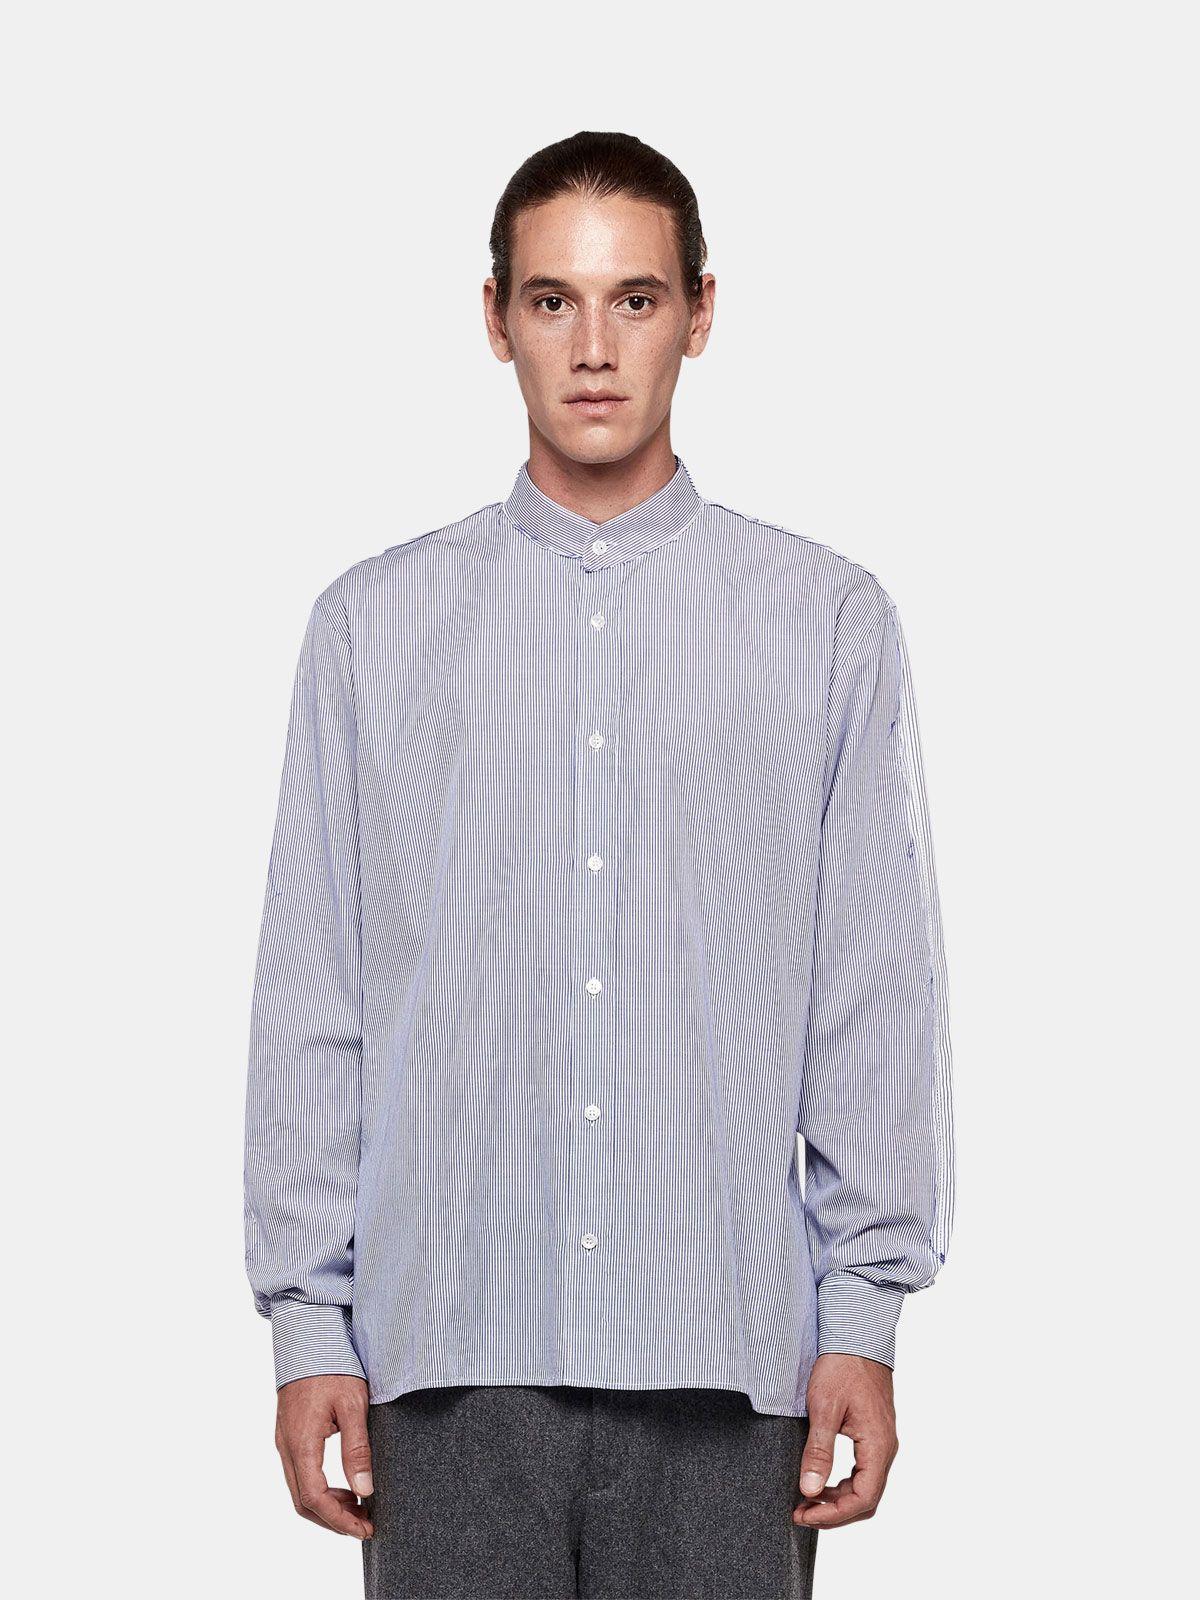 Golden Goose - Yuji shirt in cotton poplin  in